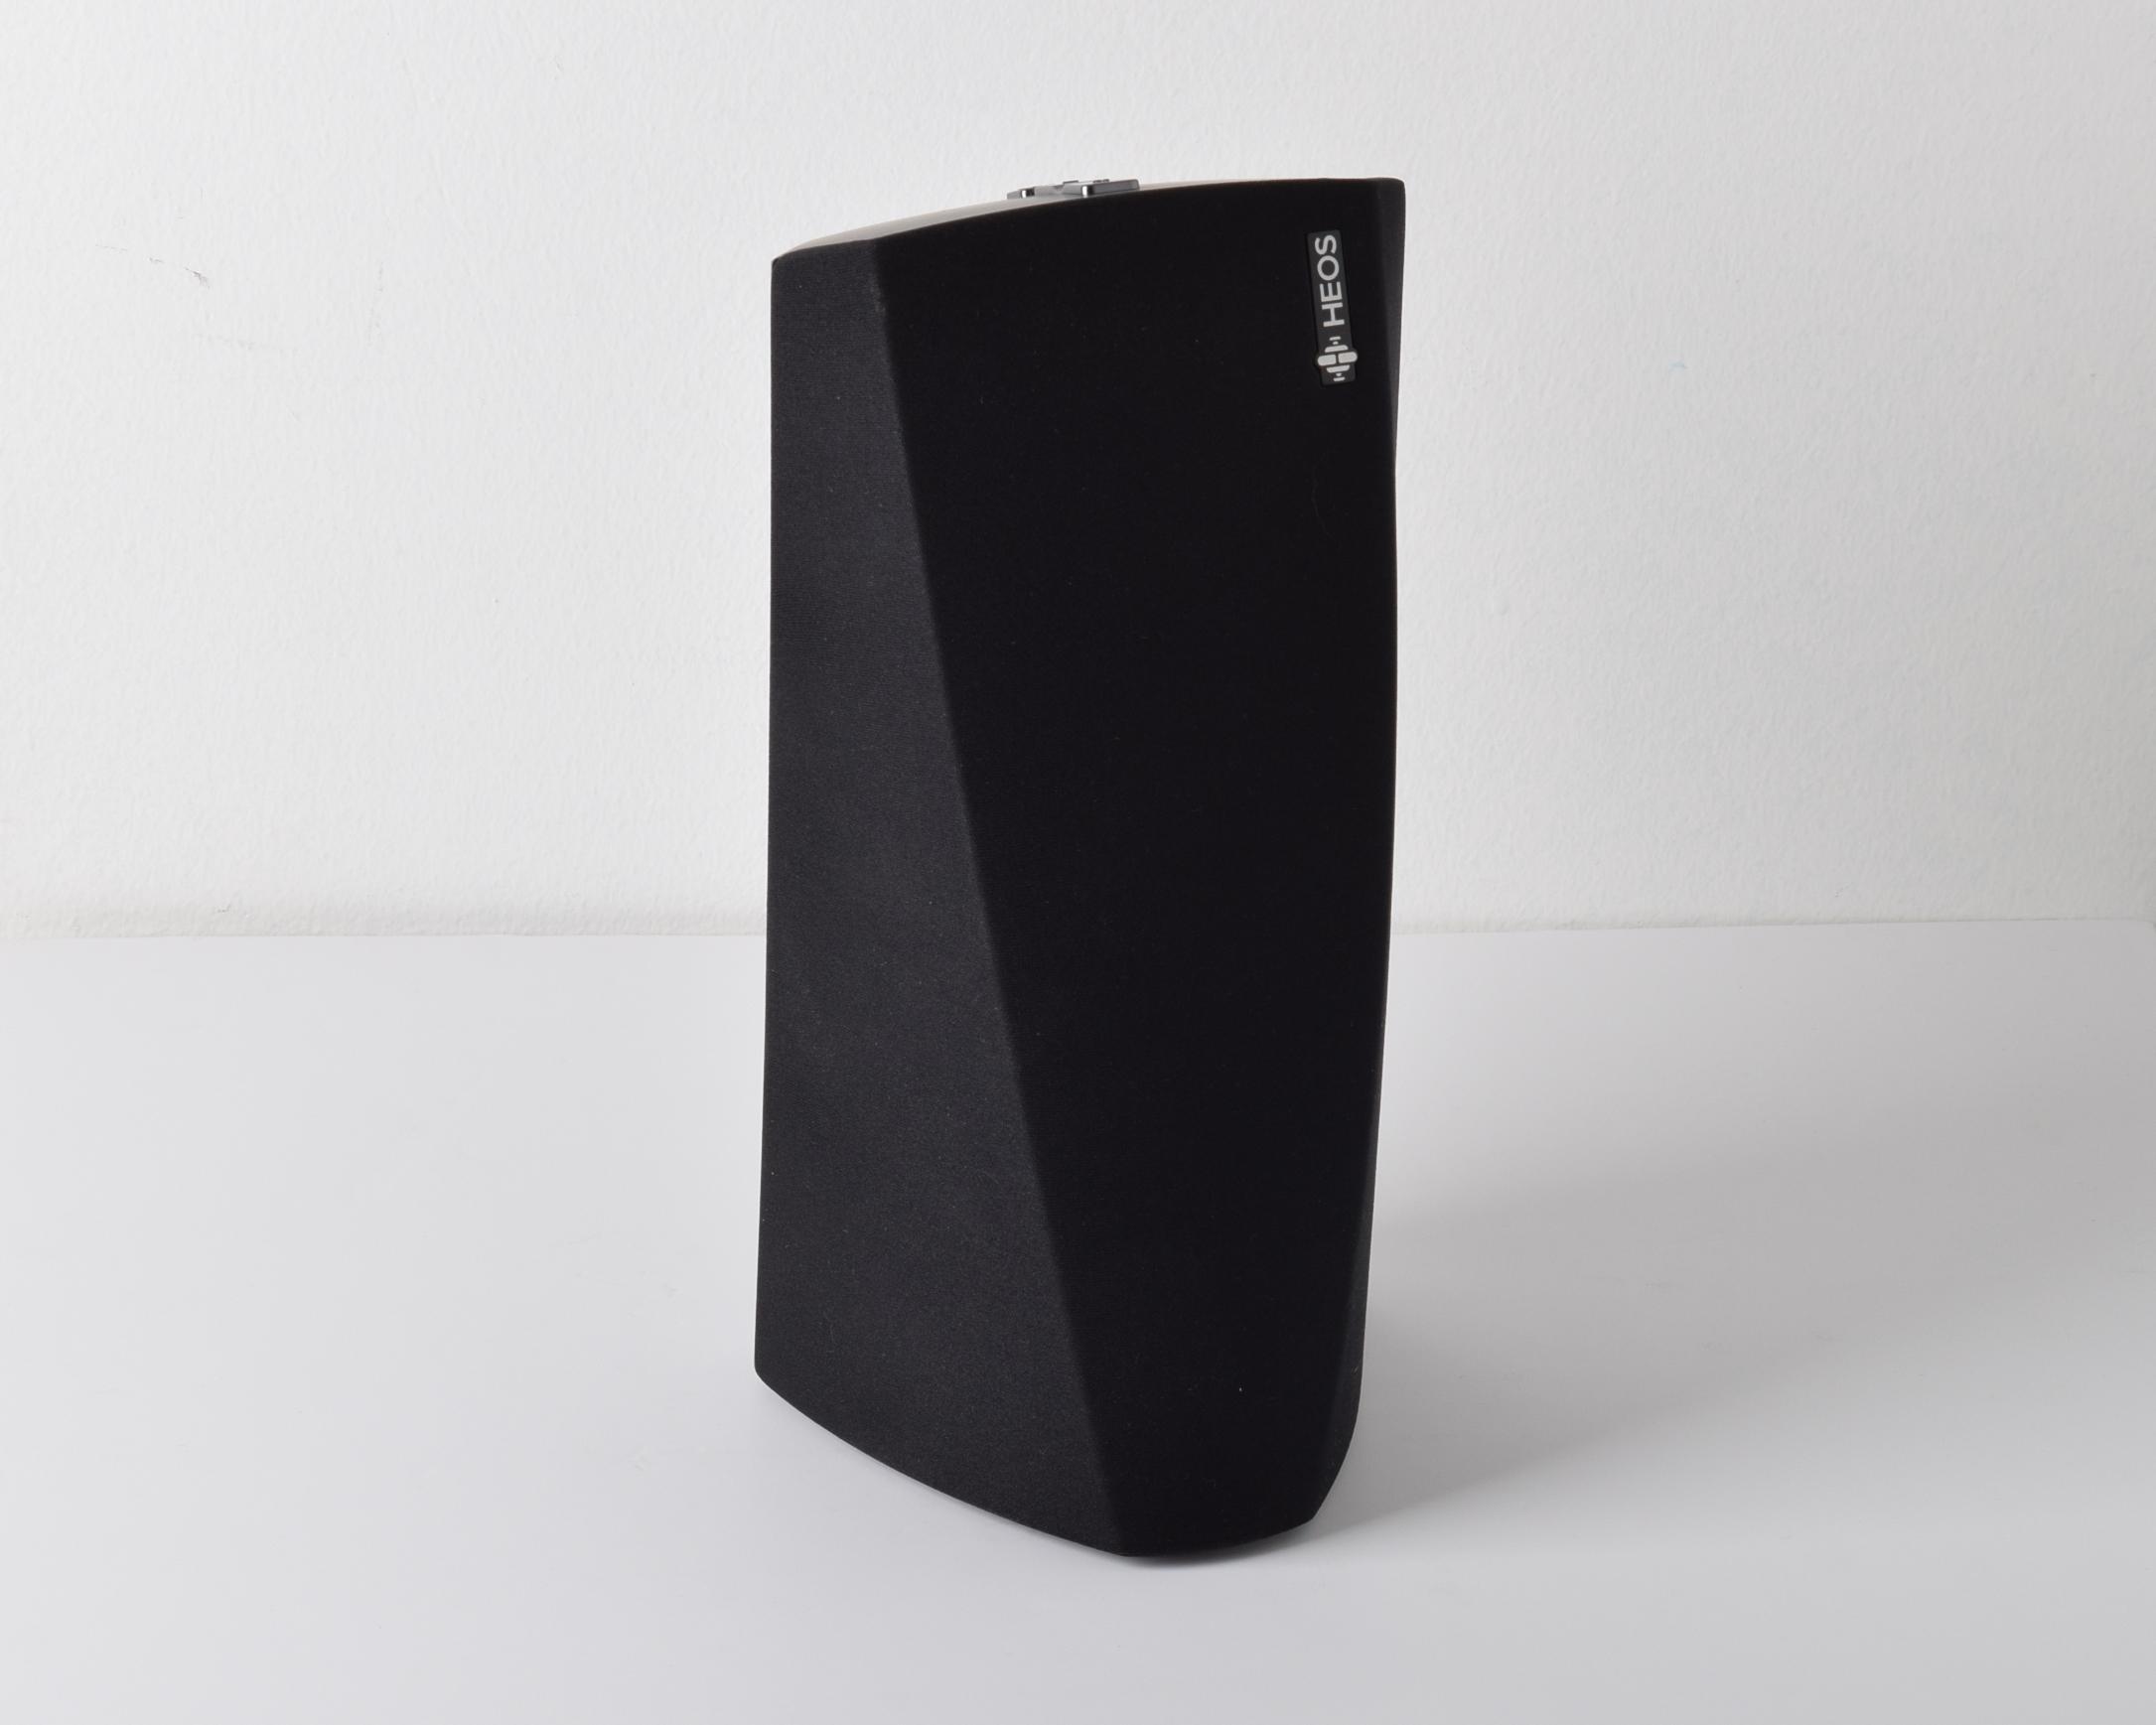 speakers, HEOS 3, Denon, Bluetooth speakers, wireless speakers, HEOS 5, HEOS 7